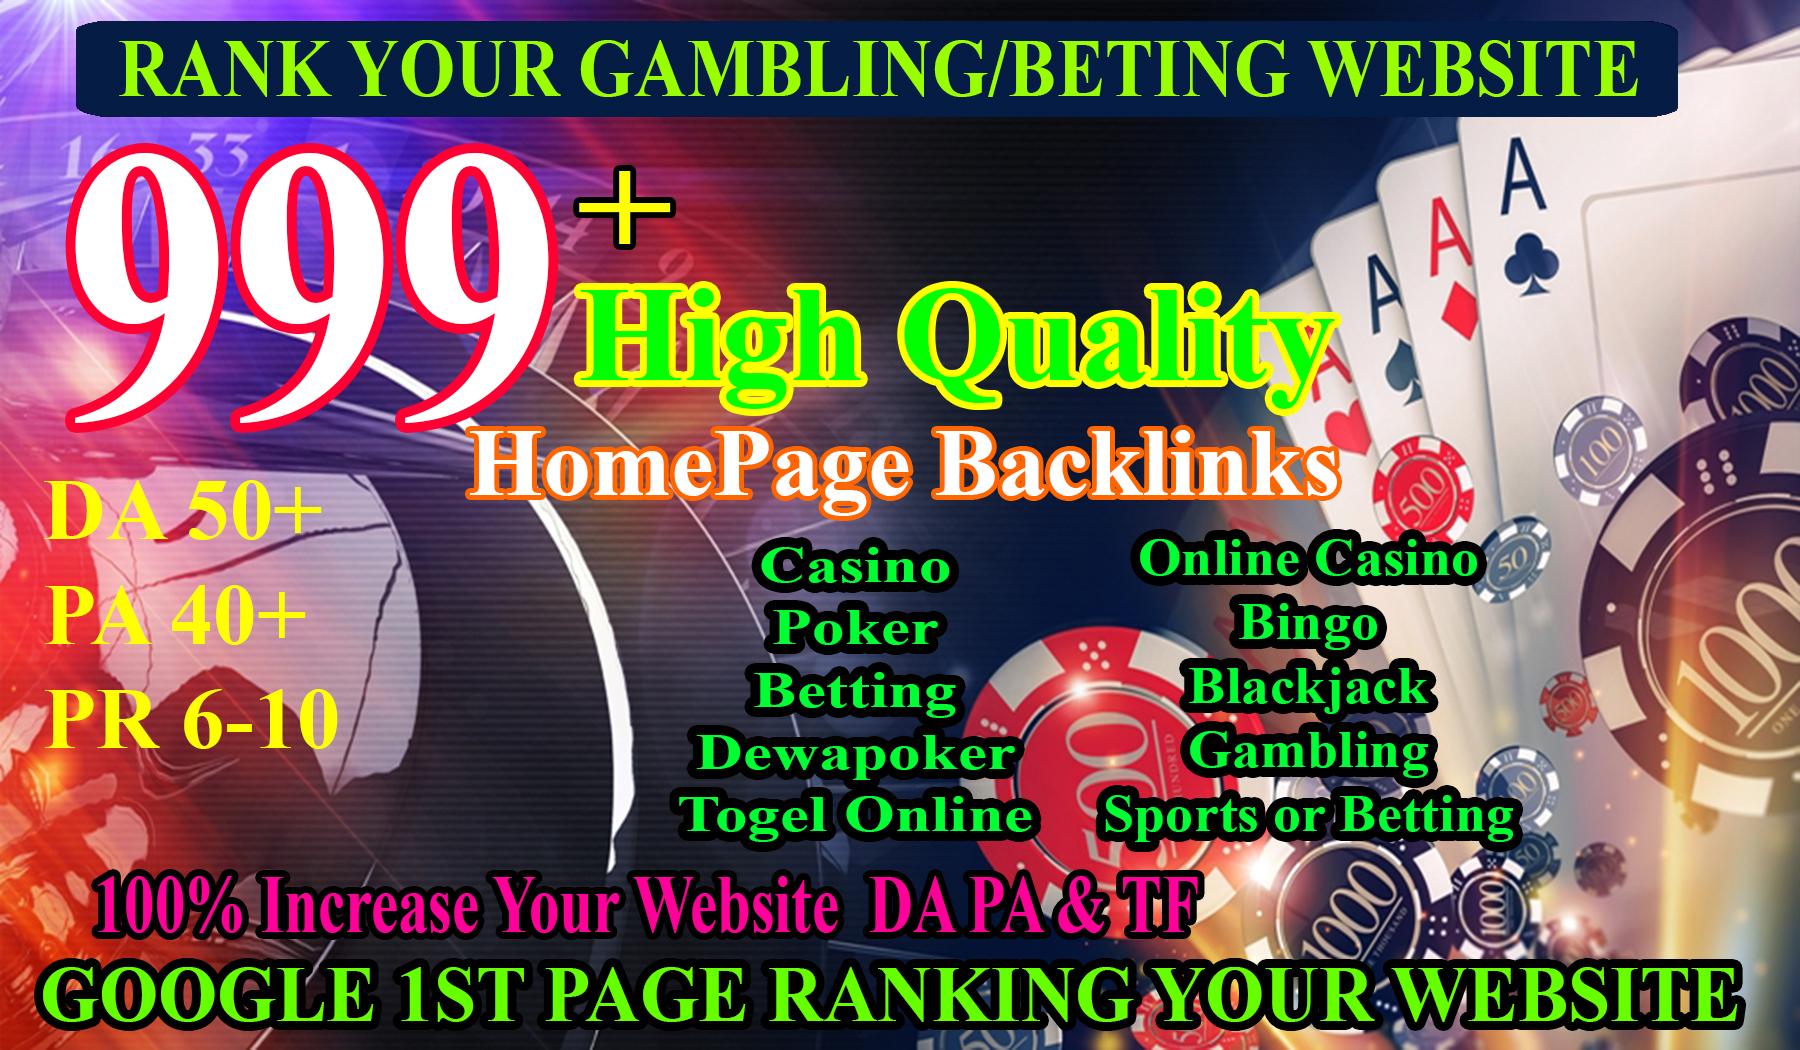 Hot Offer 999+ Powerful Casino,  Gambling,  Poker,  Sports High Quality Homepage Backlinks DA70+ PA50+